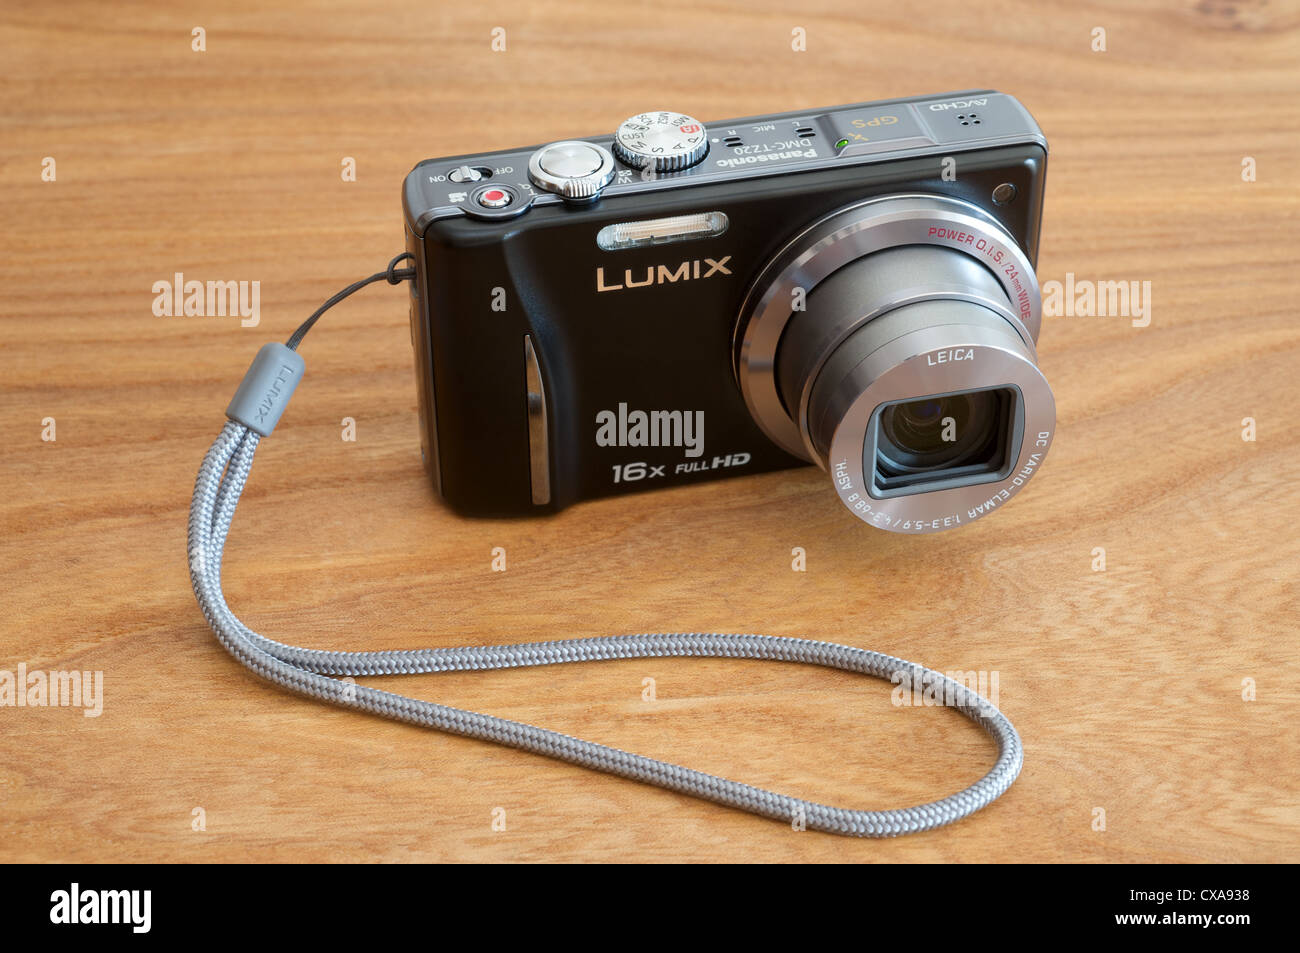 Panasonic Lumix TZ20 digital camera - Stock Image